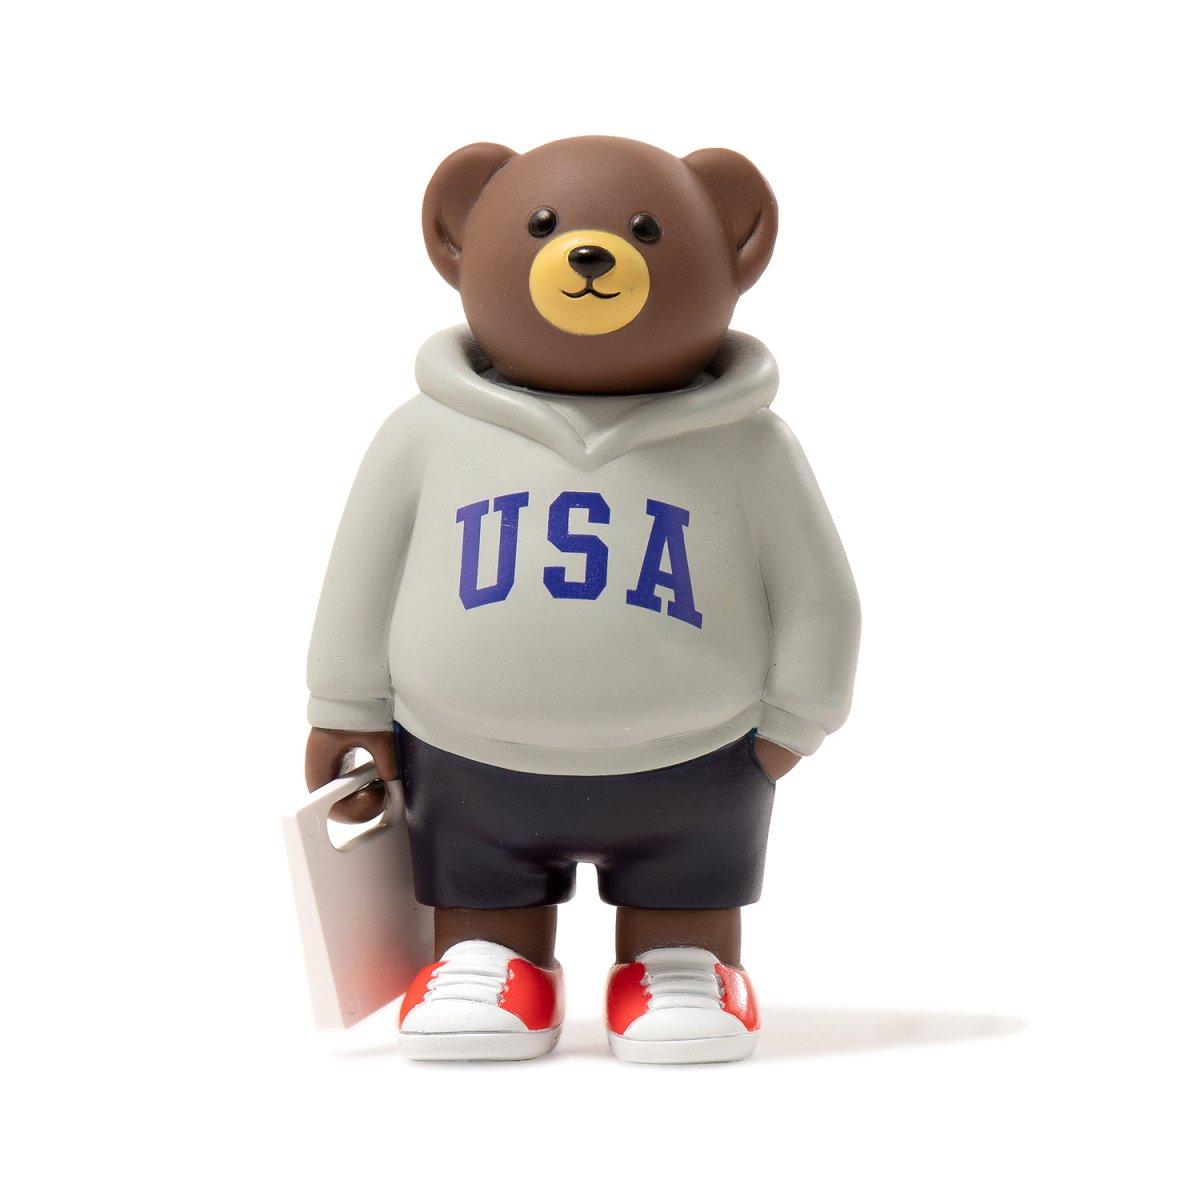 "【Knick Knacks】Wicked Bear ""USA""                           </a>             <span class="